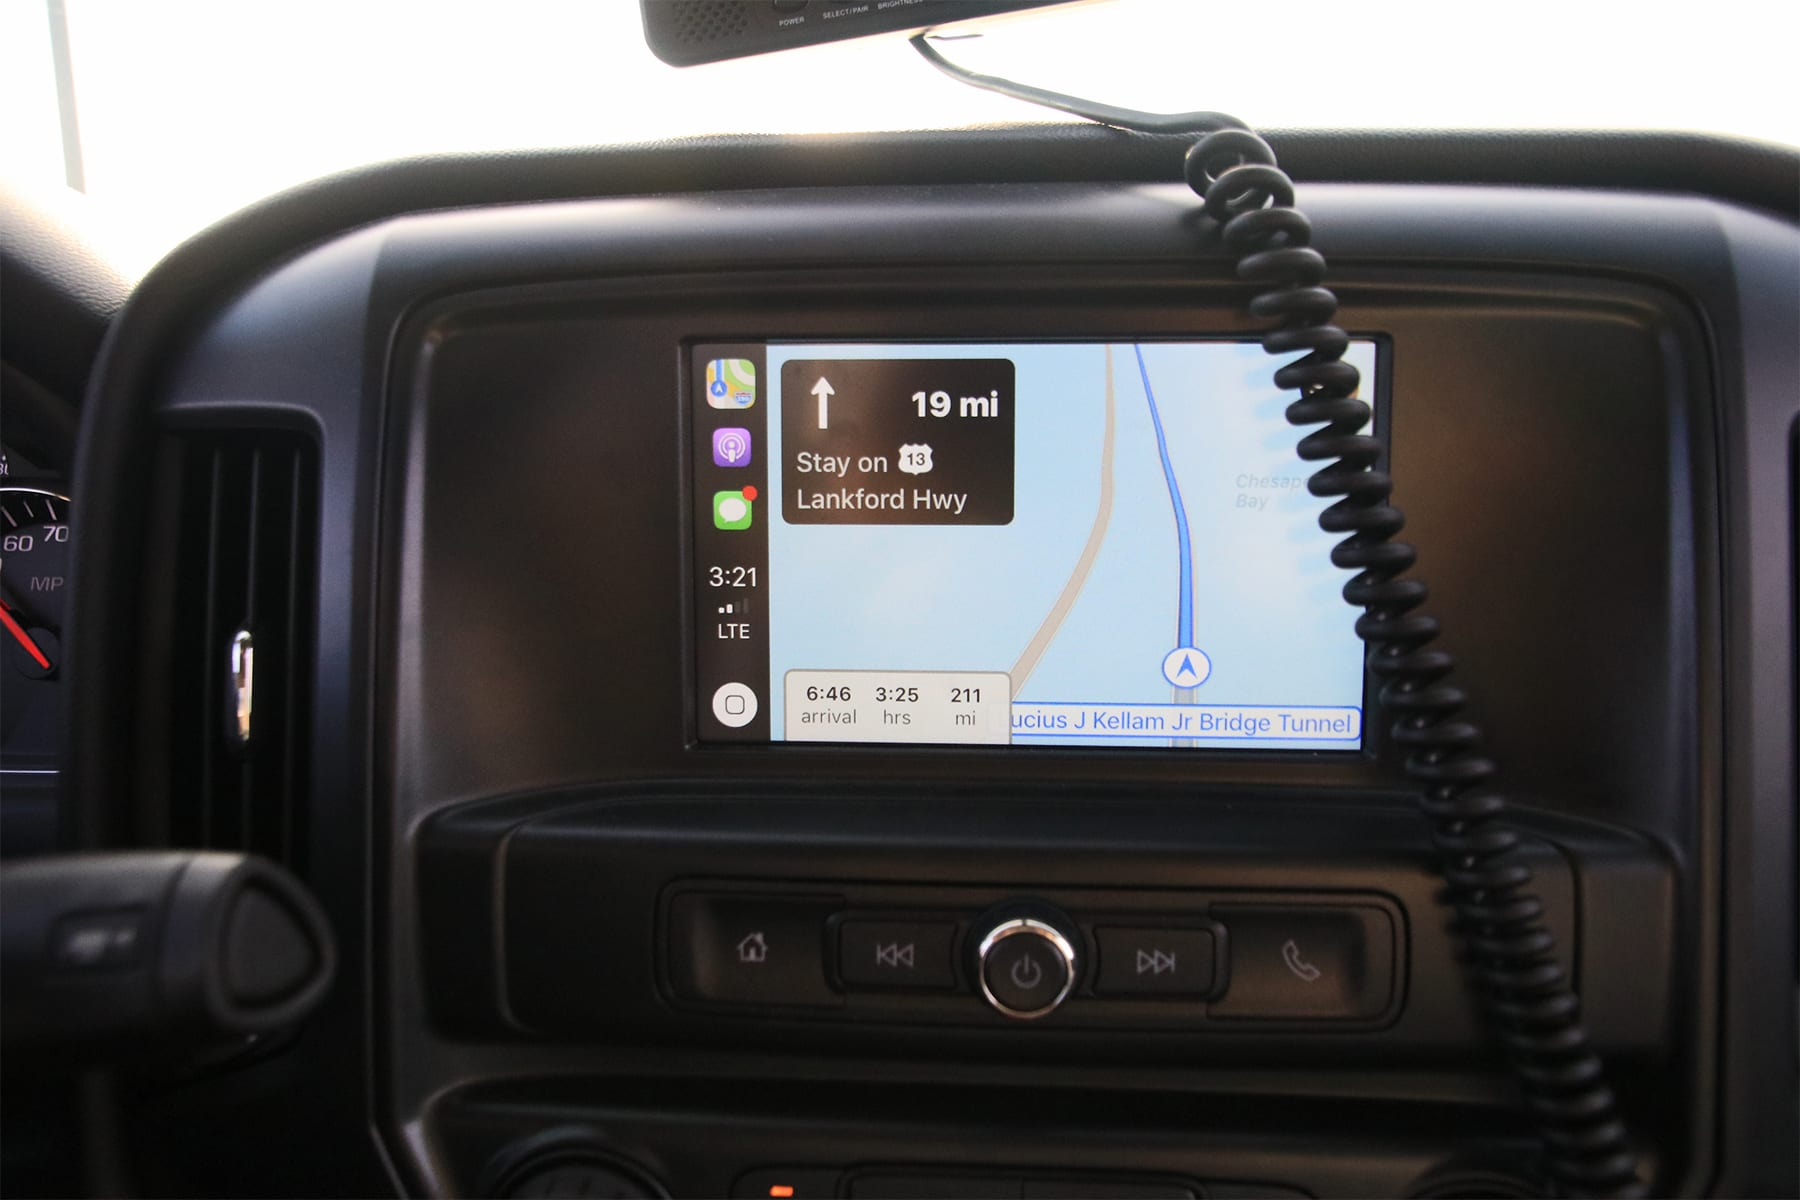 journey-11-VA-drivetoNC02.jpg